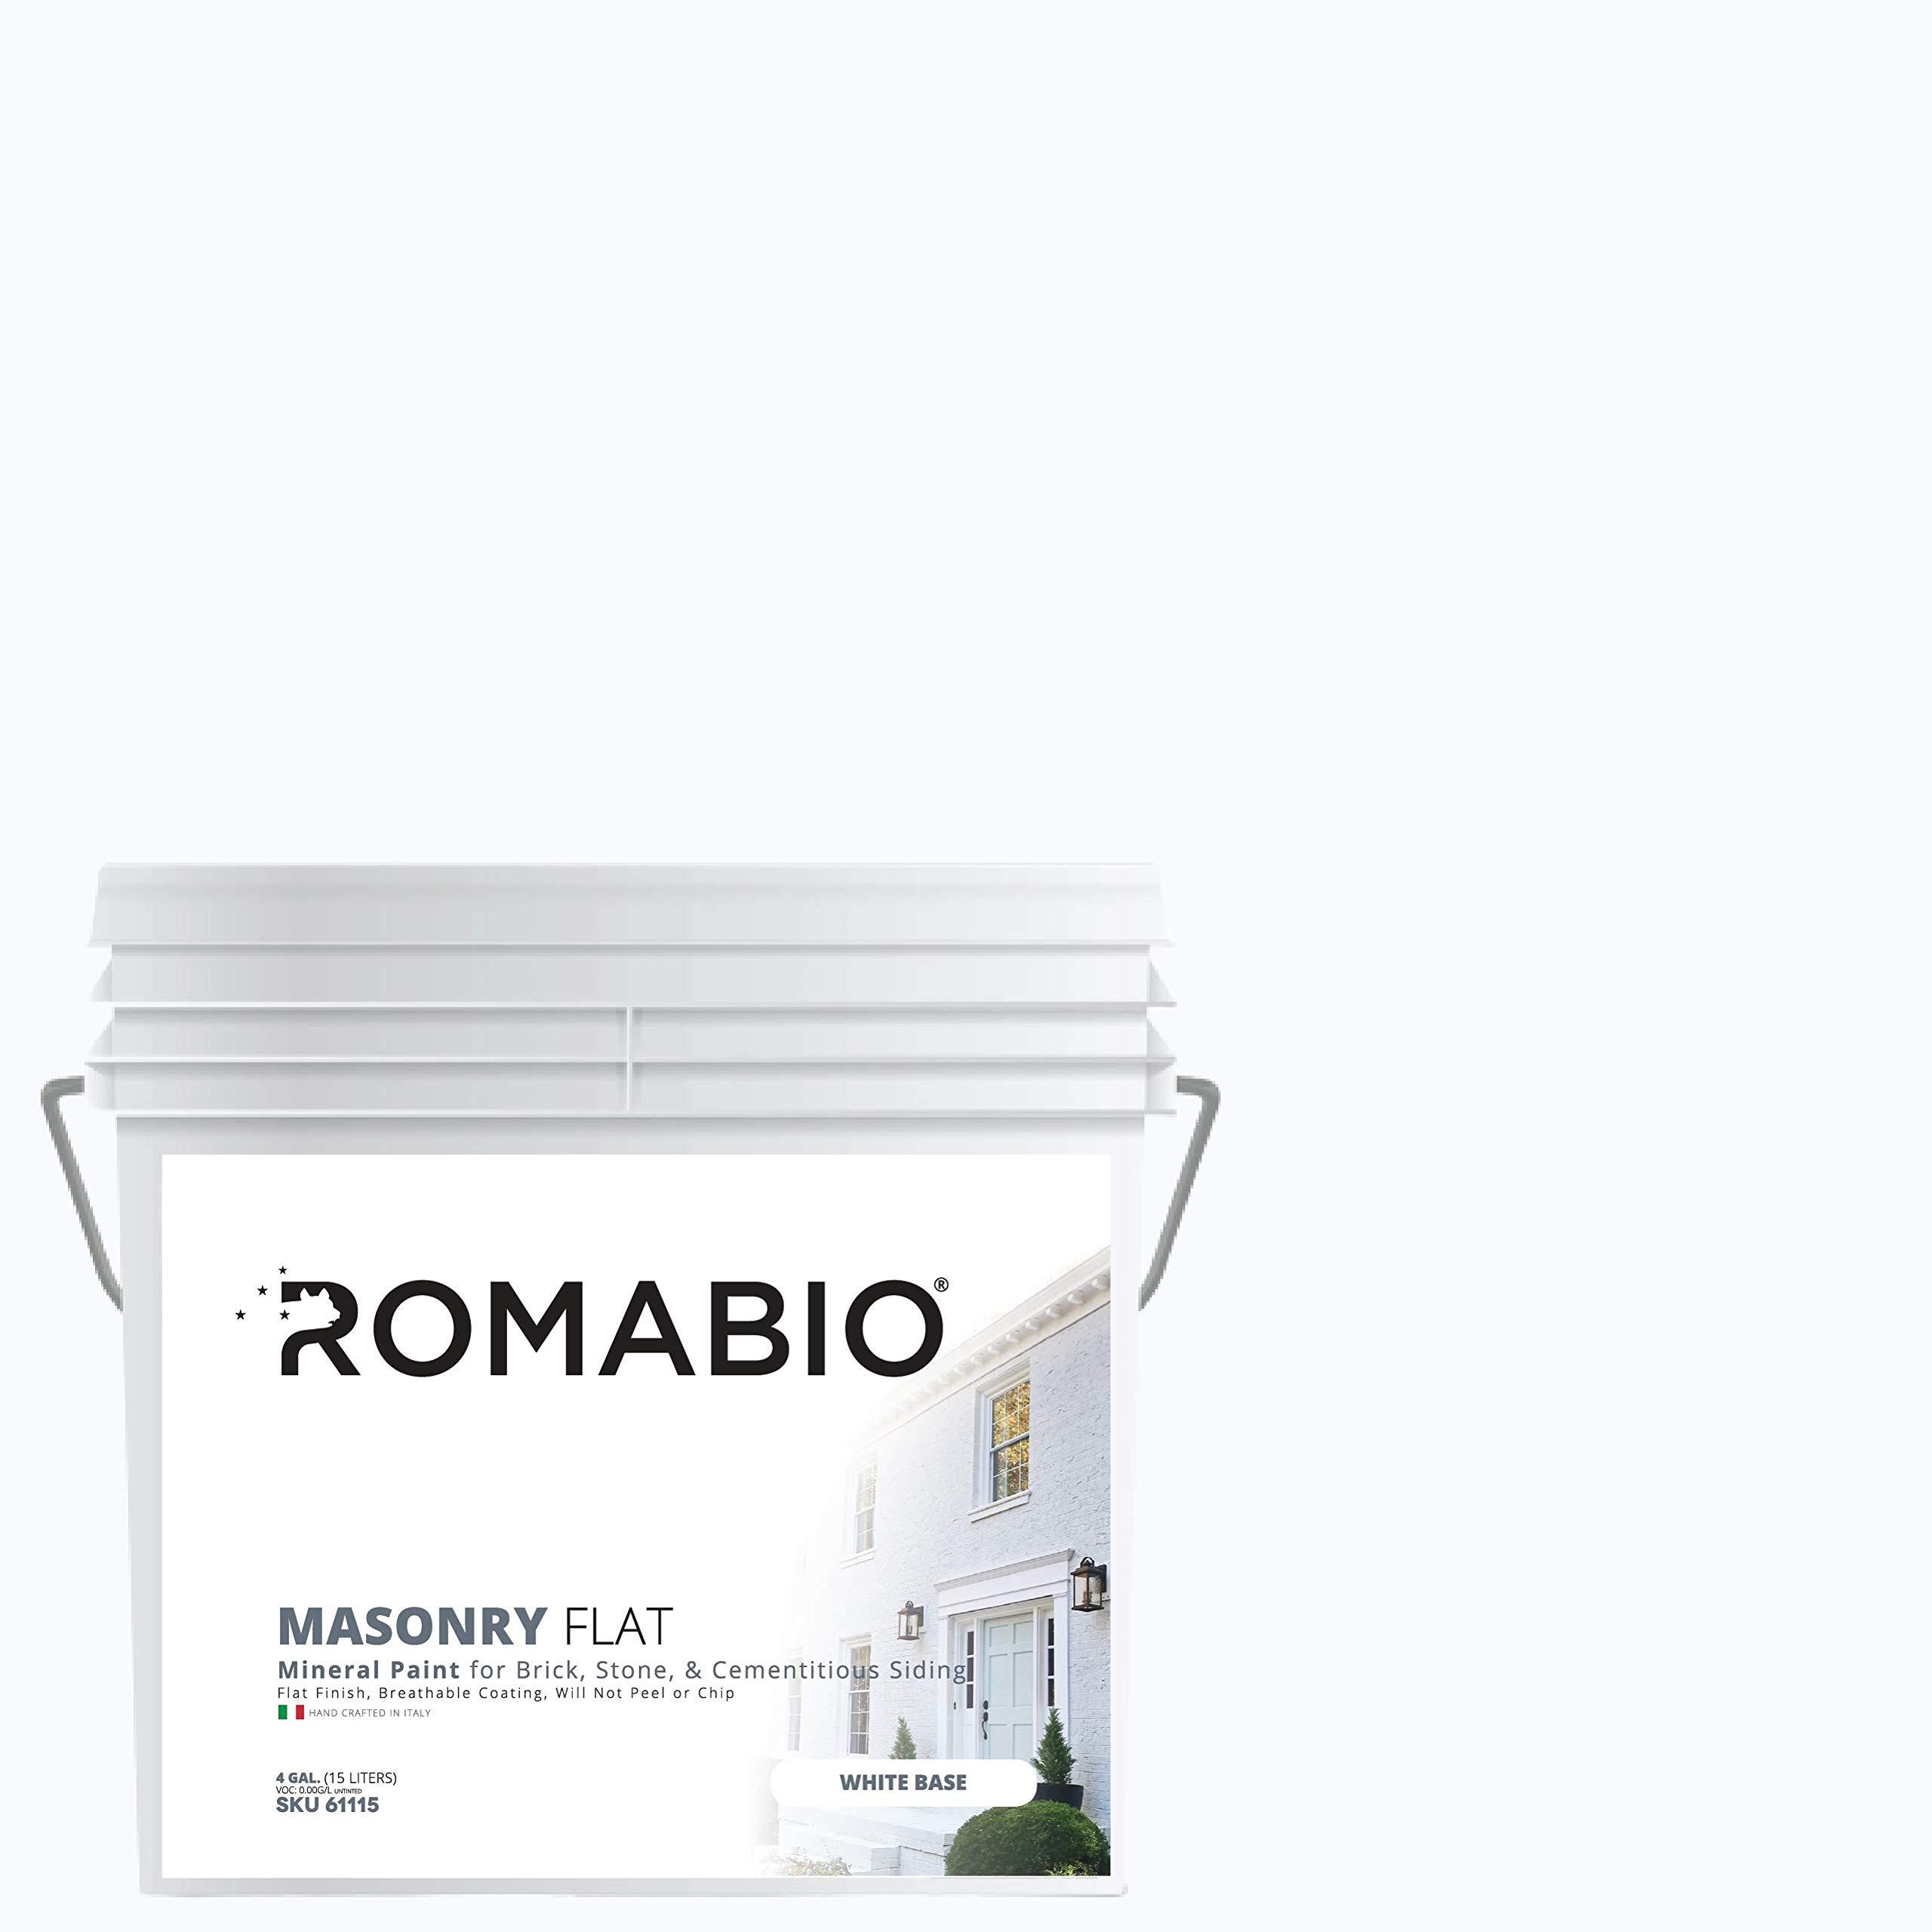 Romabio Masonry Flat, Italian Mineral Paint for Brick, Stone & Cementitious Siding, Richmond White, 15L/4GAL